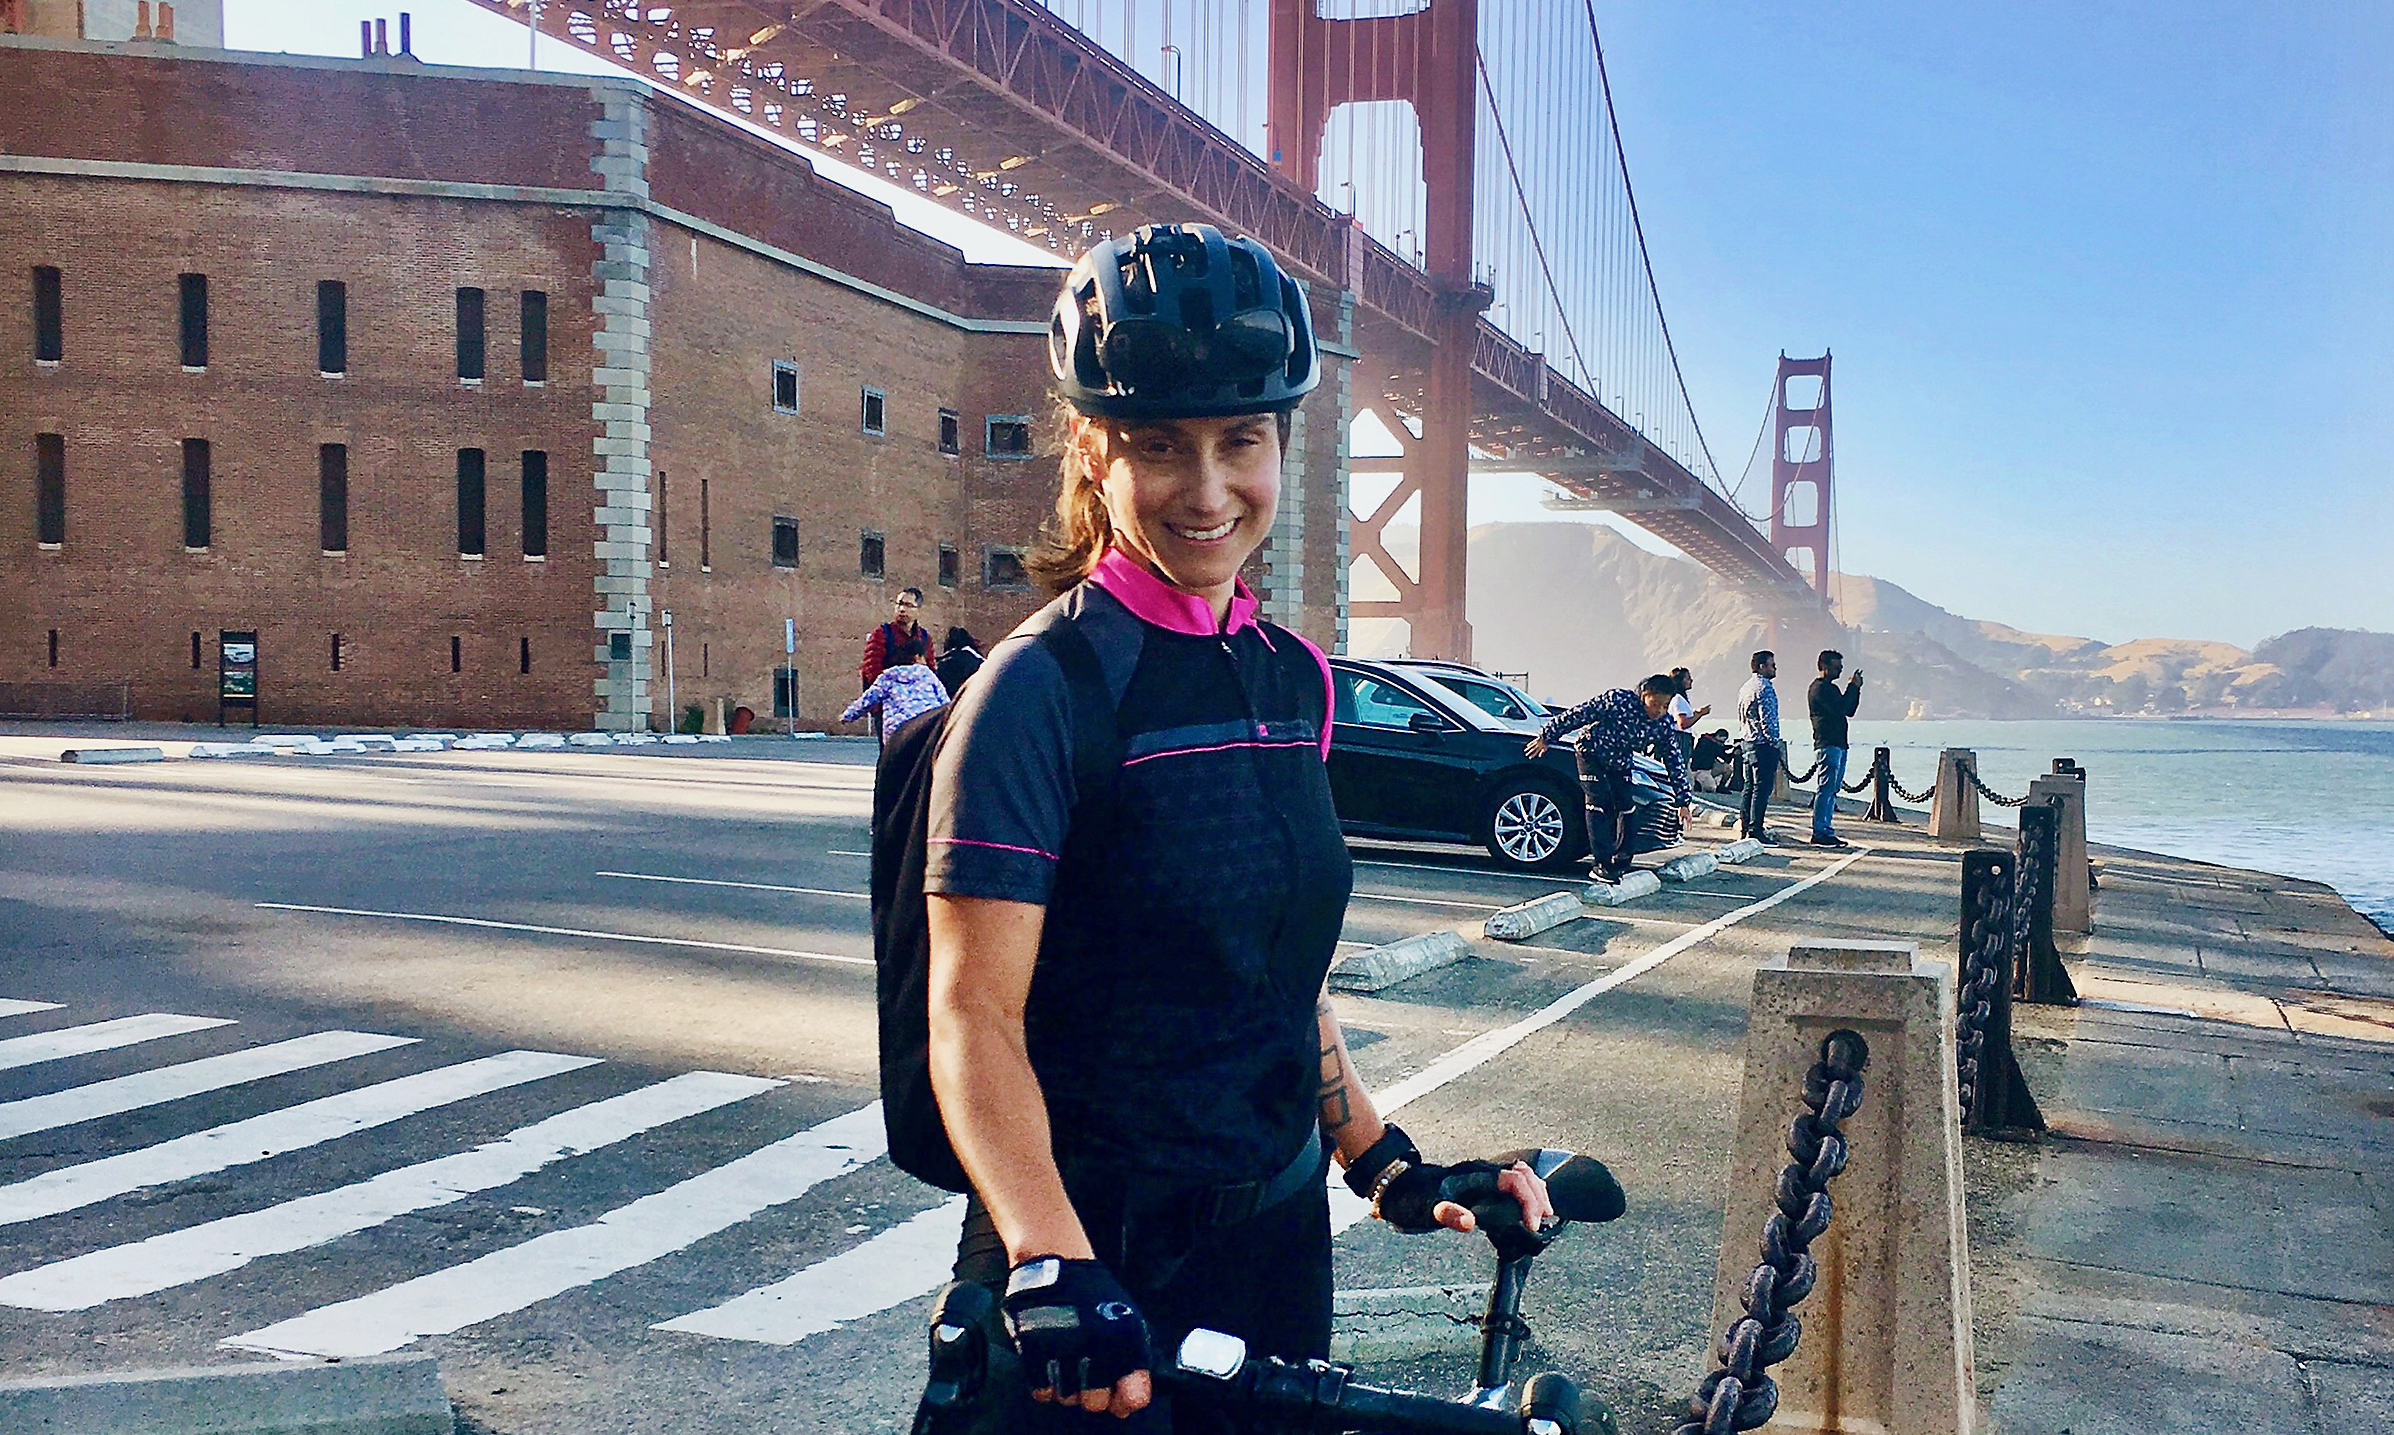 Hilary Noll, Bike Champion of the Year